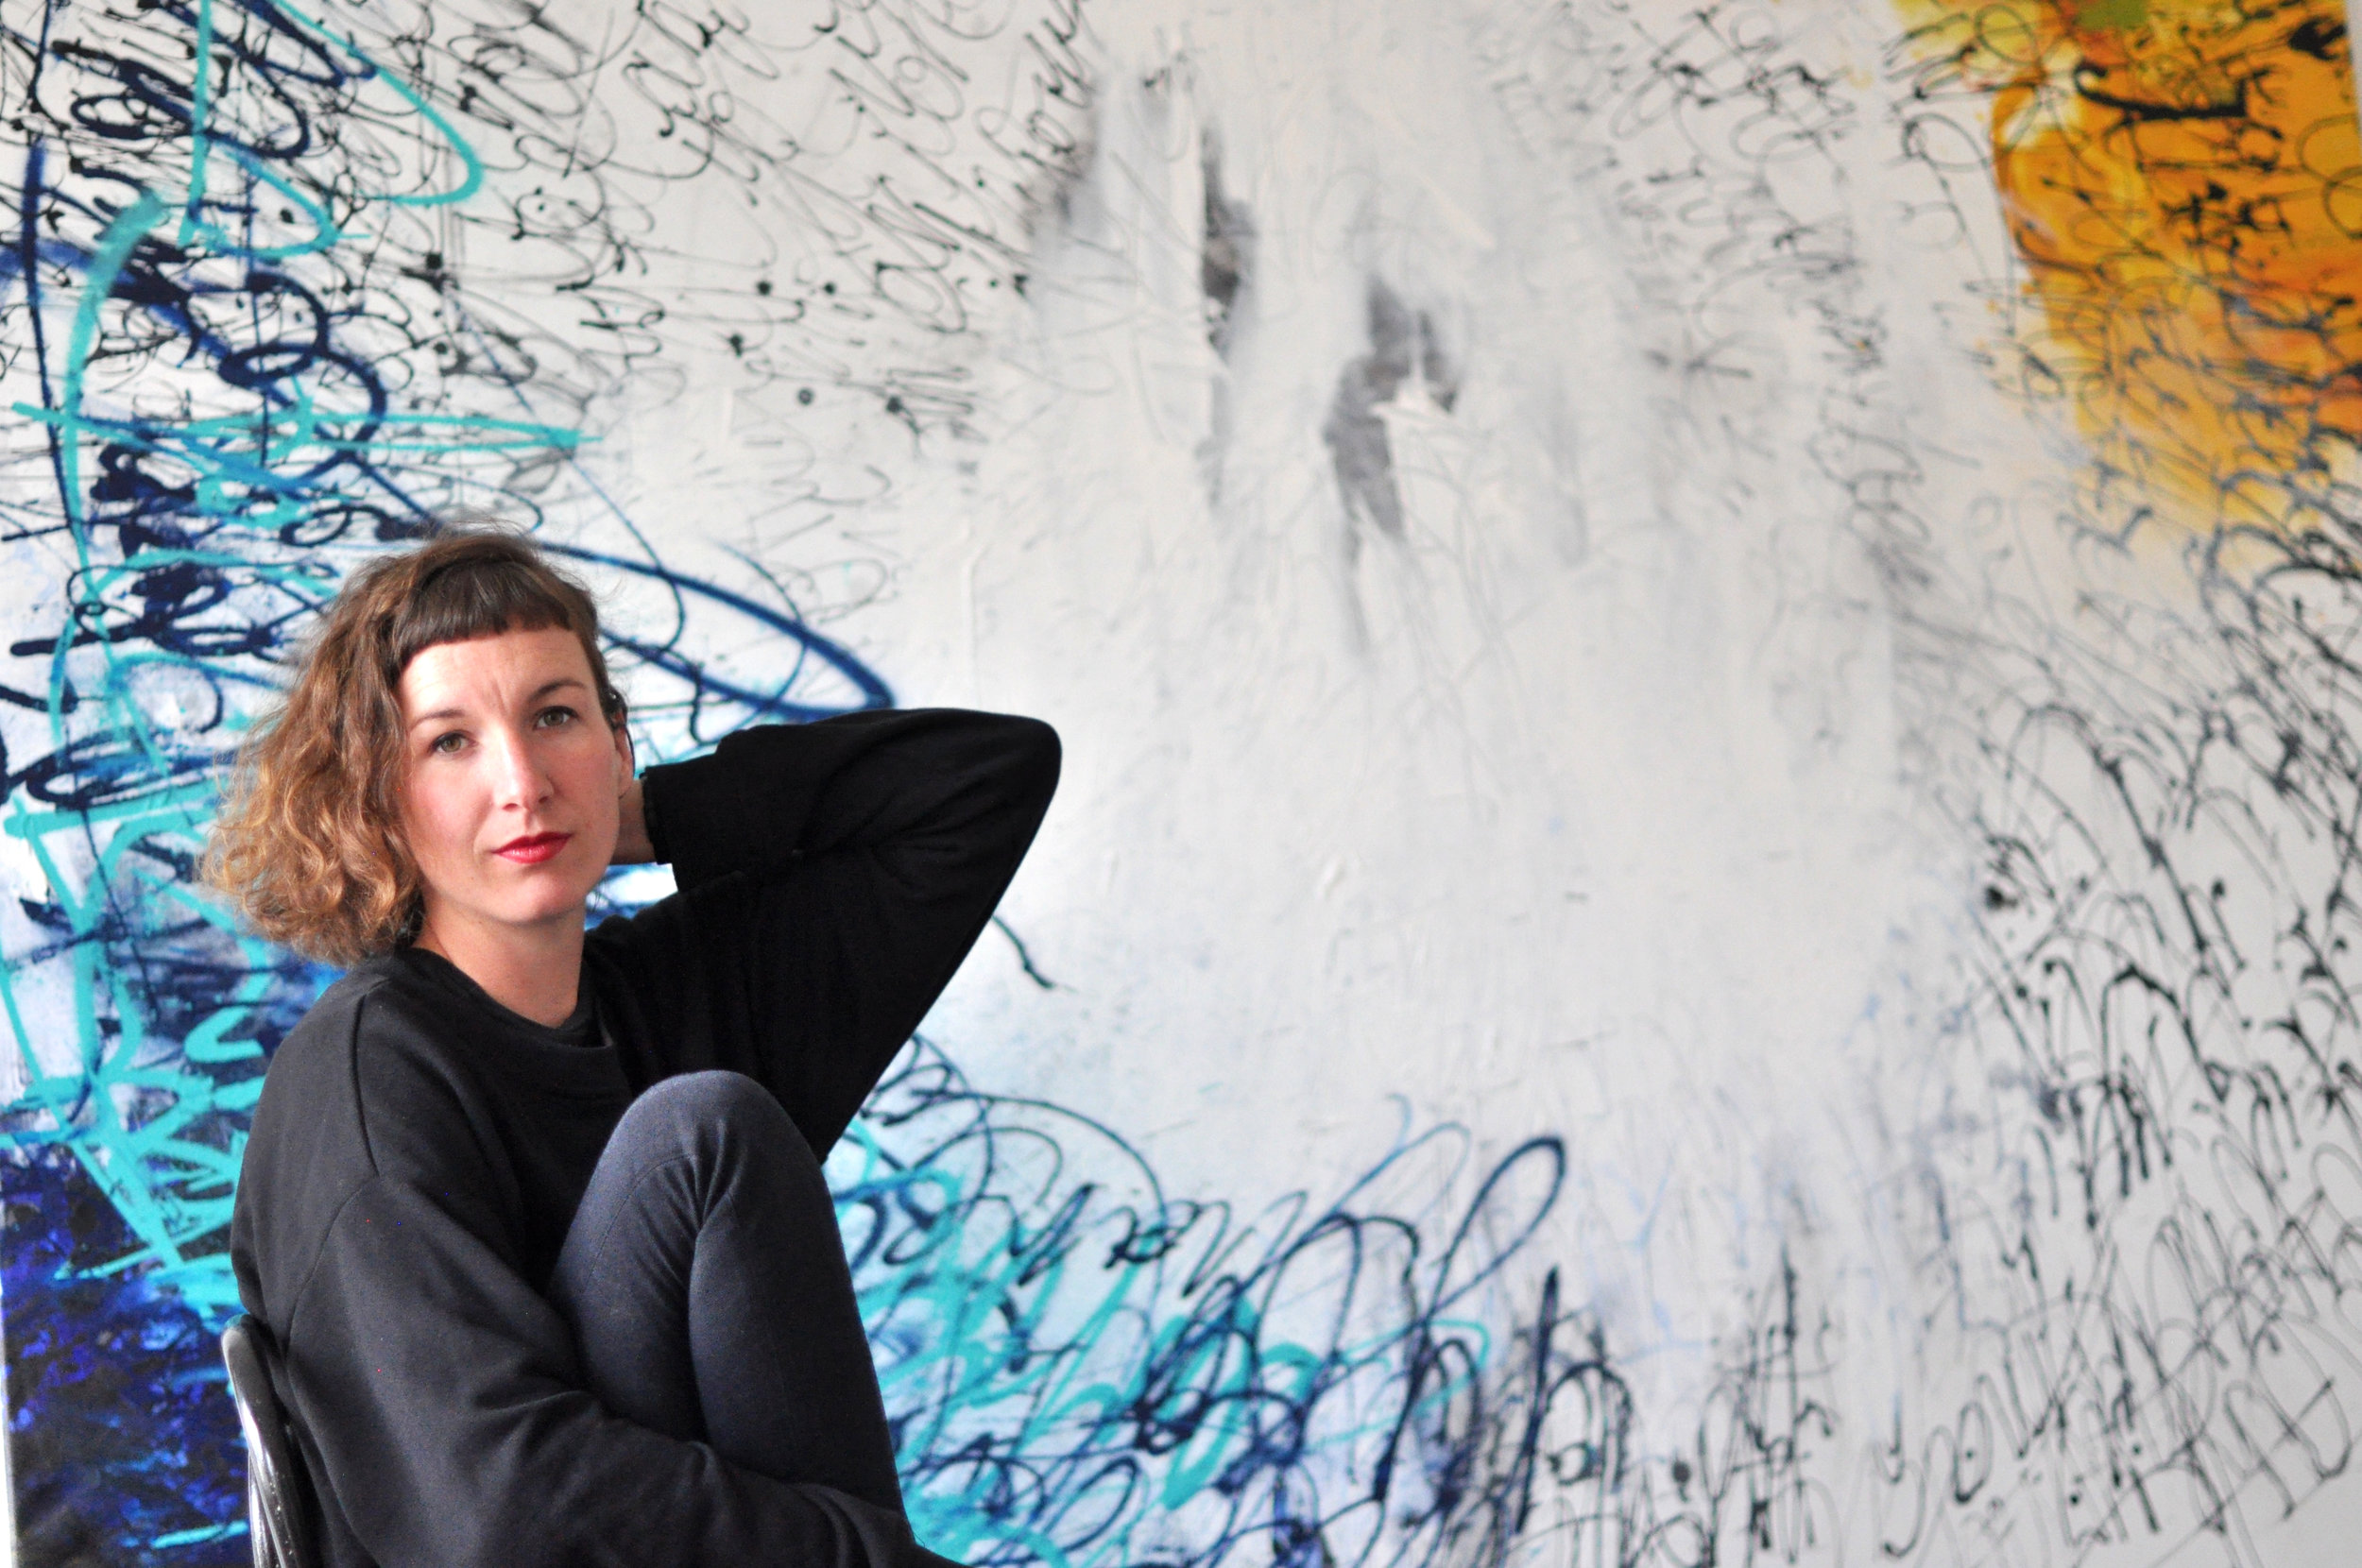 OliveGreenAnna-Painter-GermanybasedartistHeidelbergAbstractexpressionist4.jpg